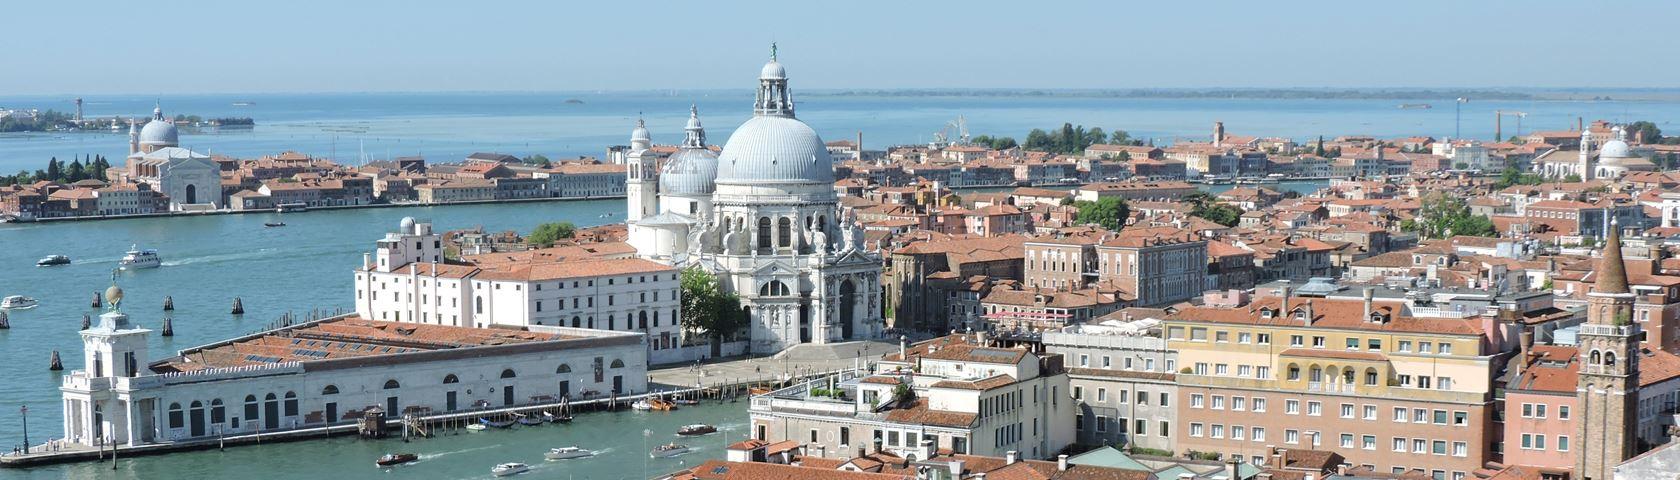 Venice Santa Maria